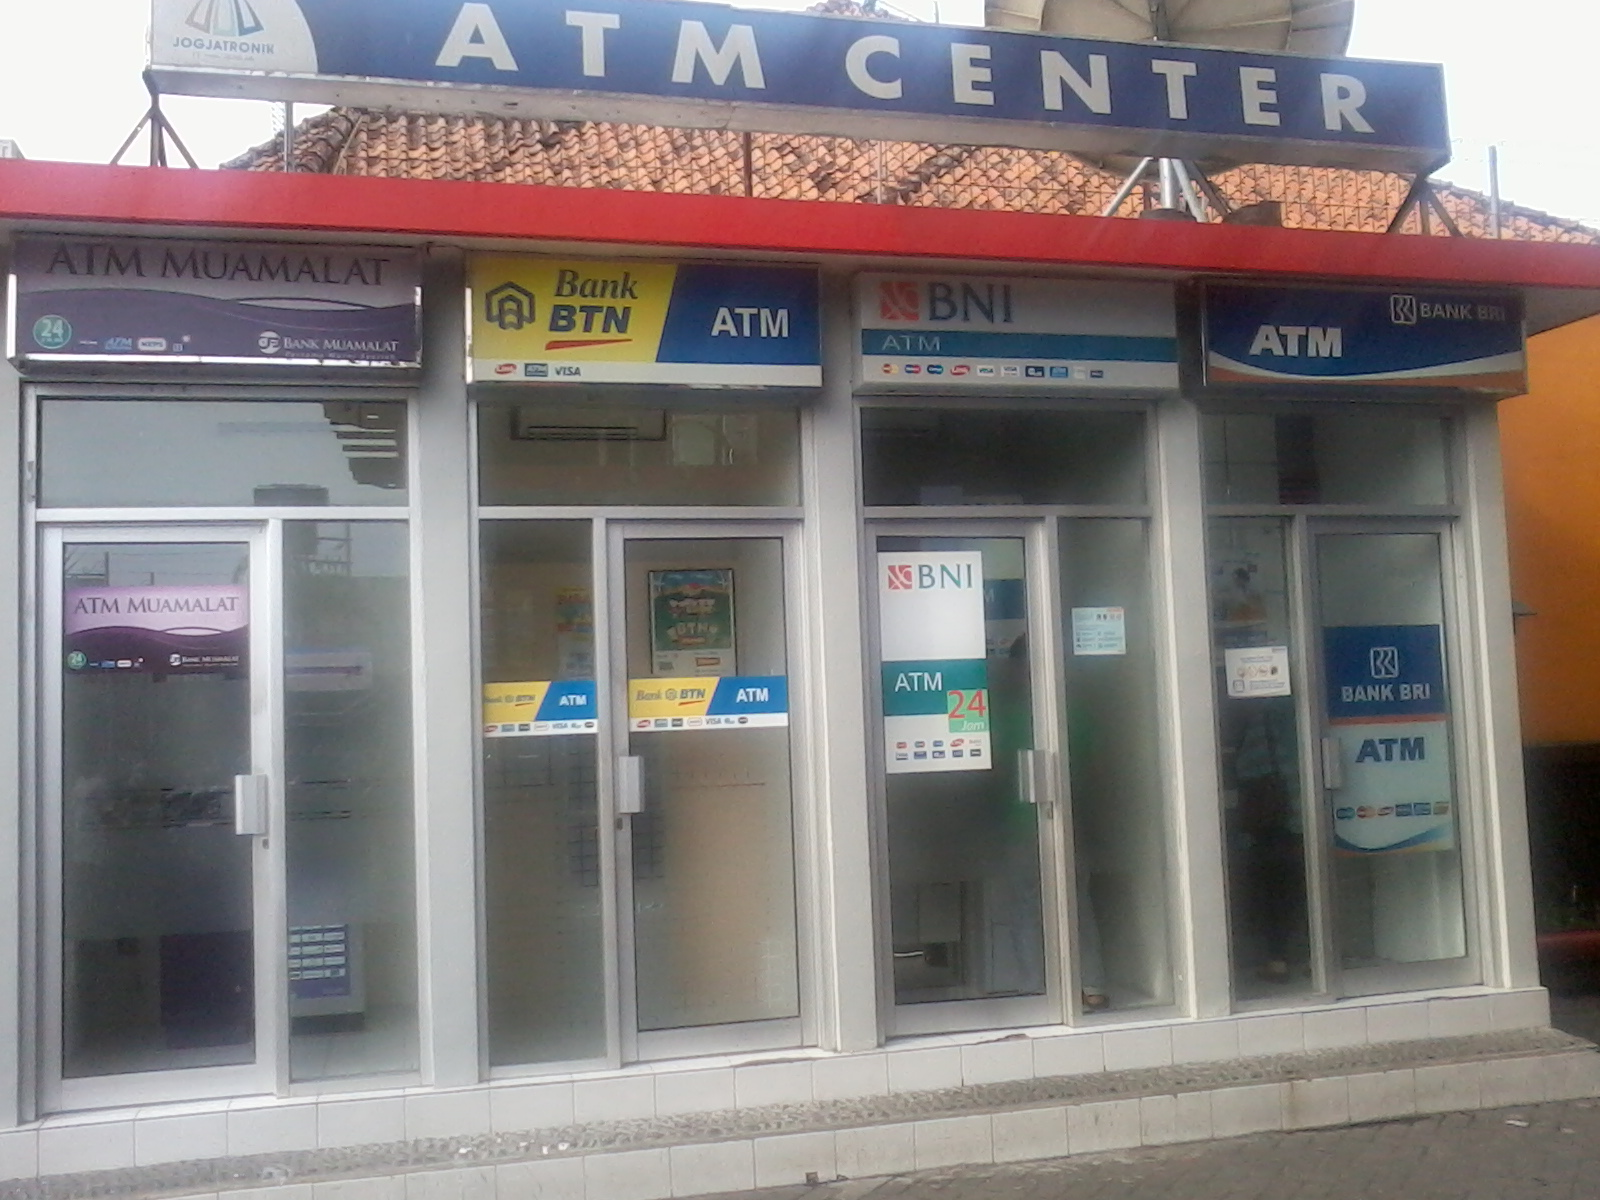 Atm Bersama Di Yogyakarta Kode Bank Pernik Jogjakarta Dari Jogja Untuk Anda